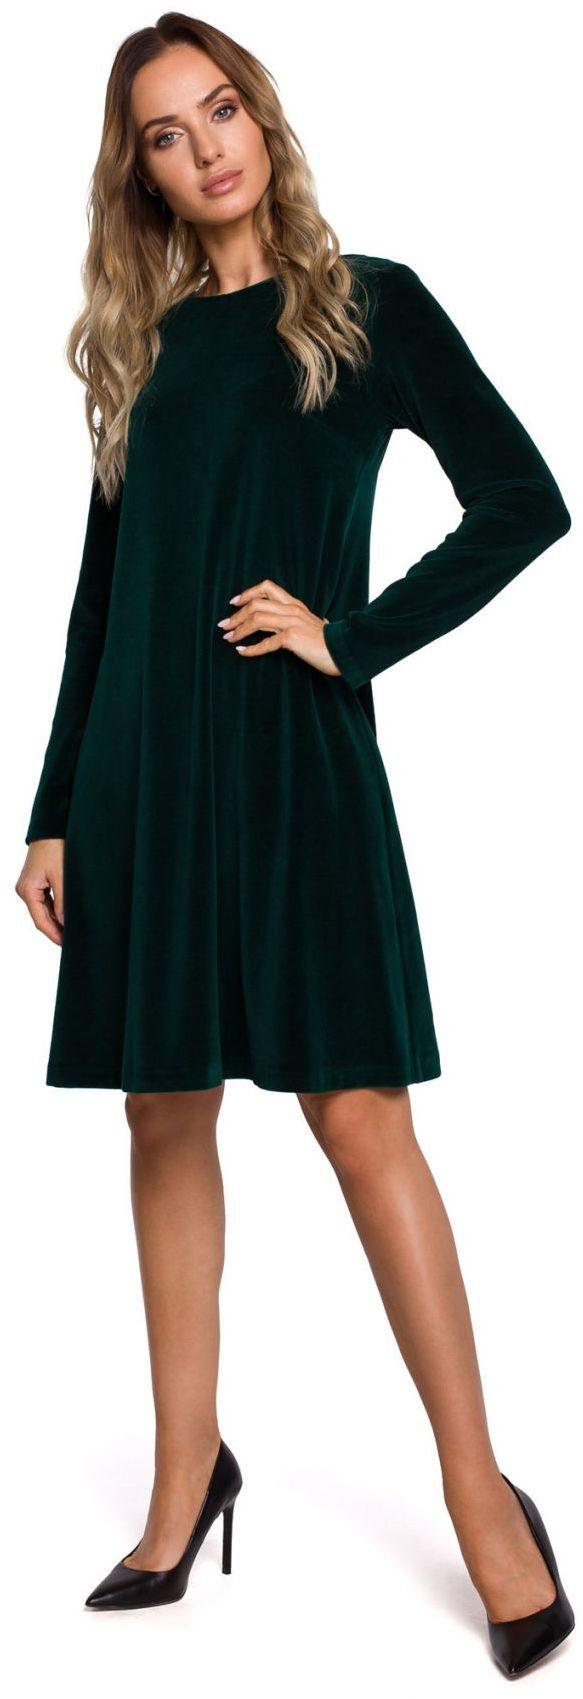 M566 Welurowa sukienka trapezowa - zielona